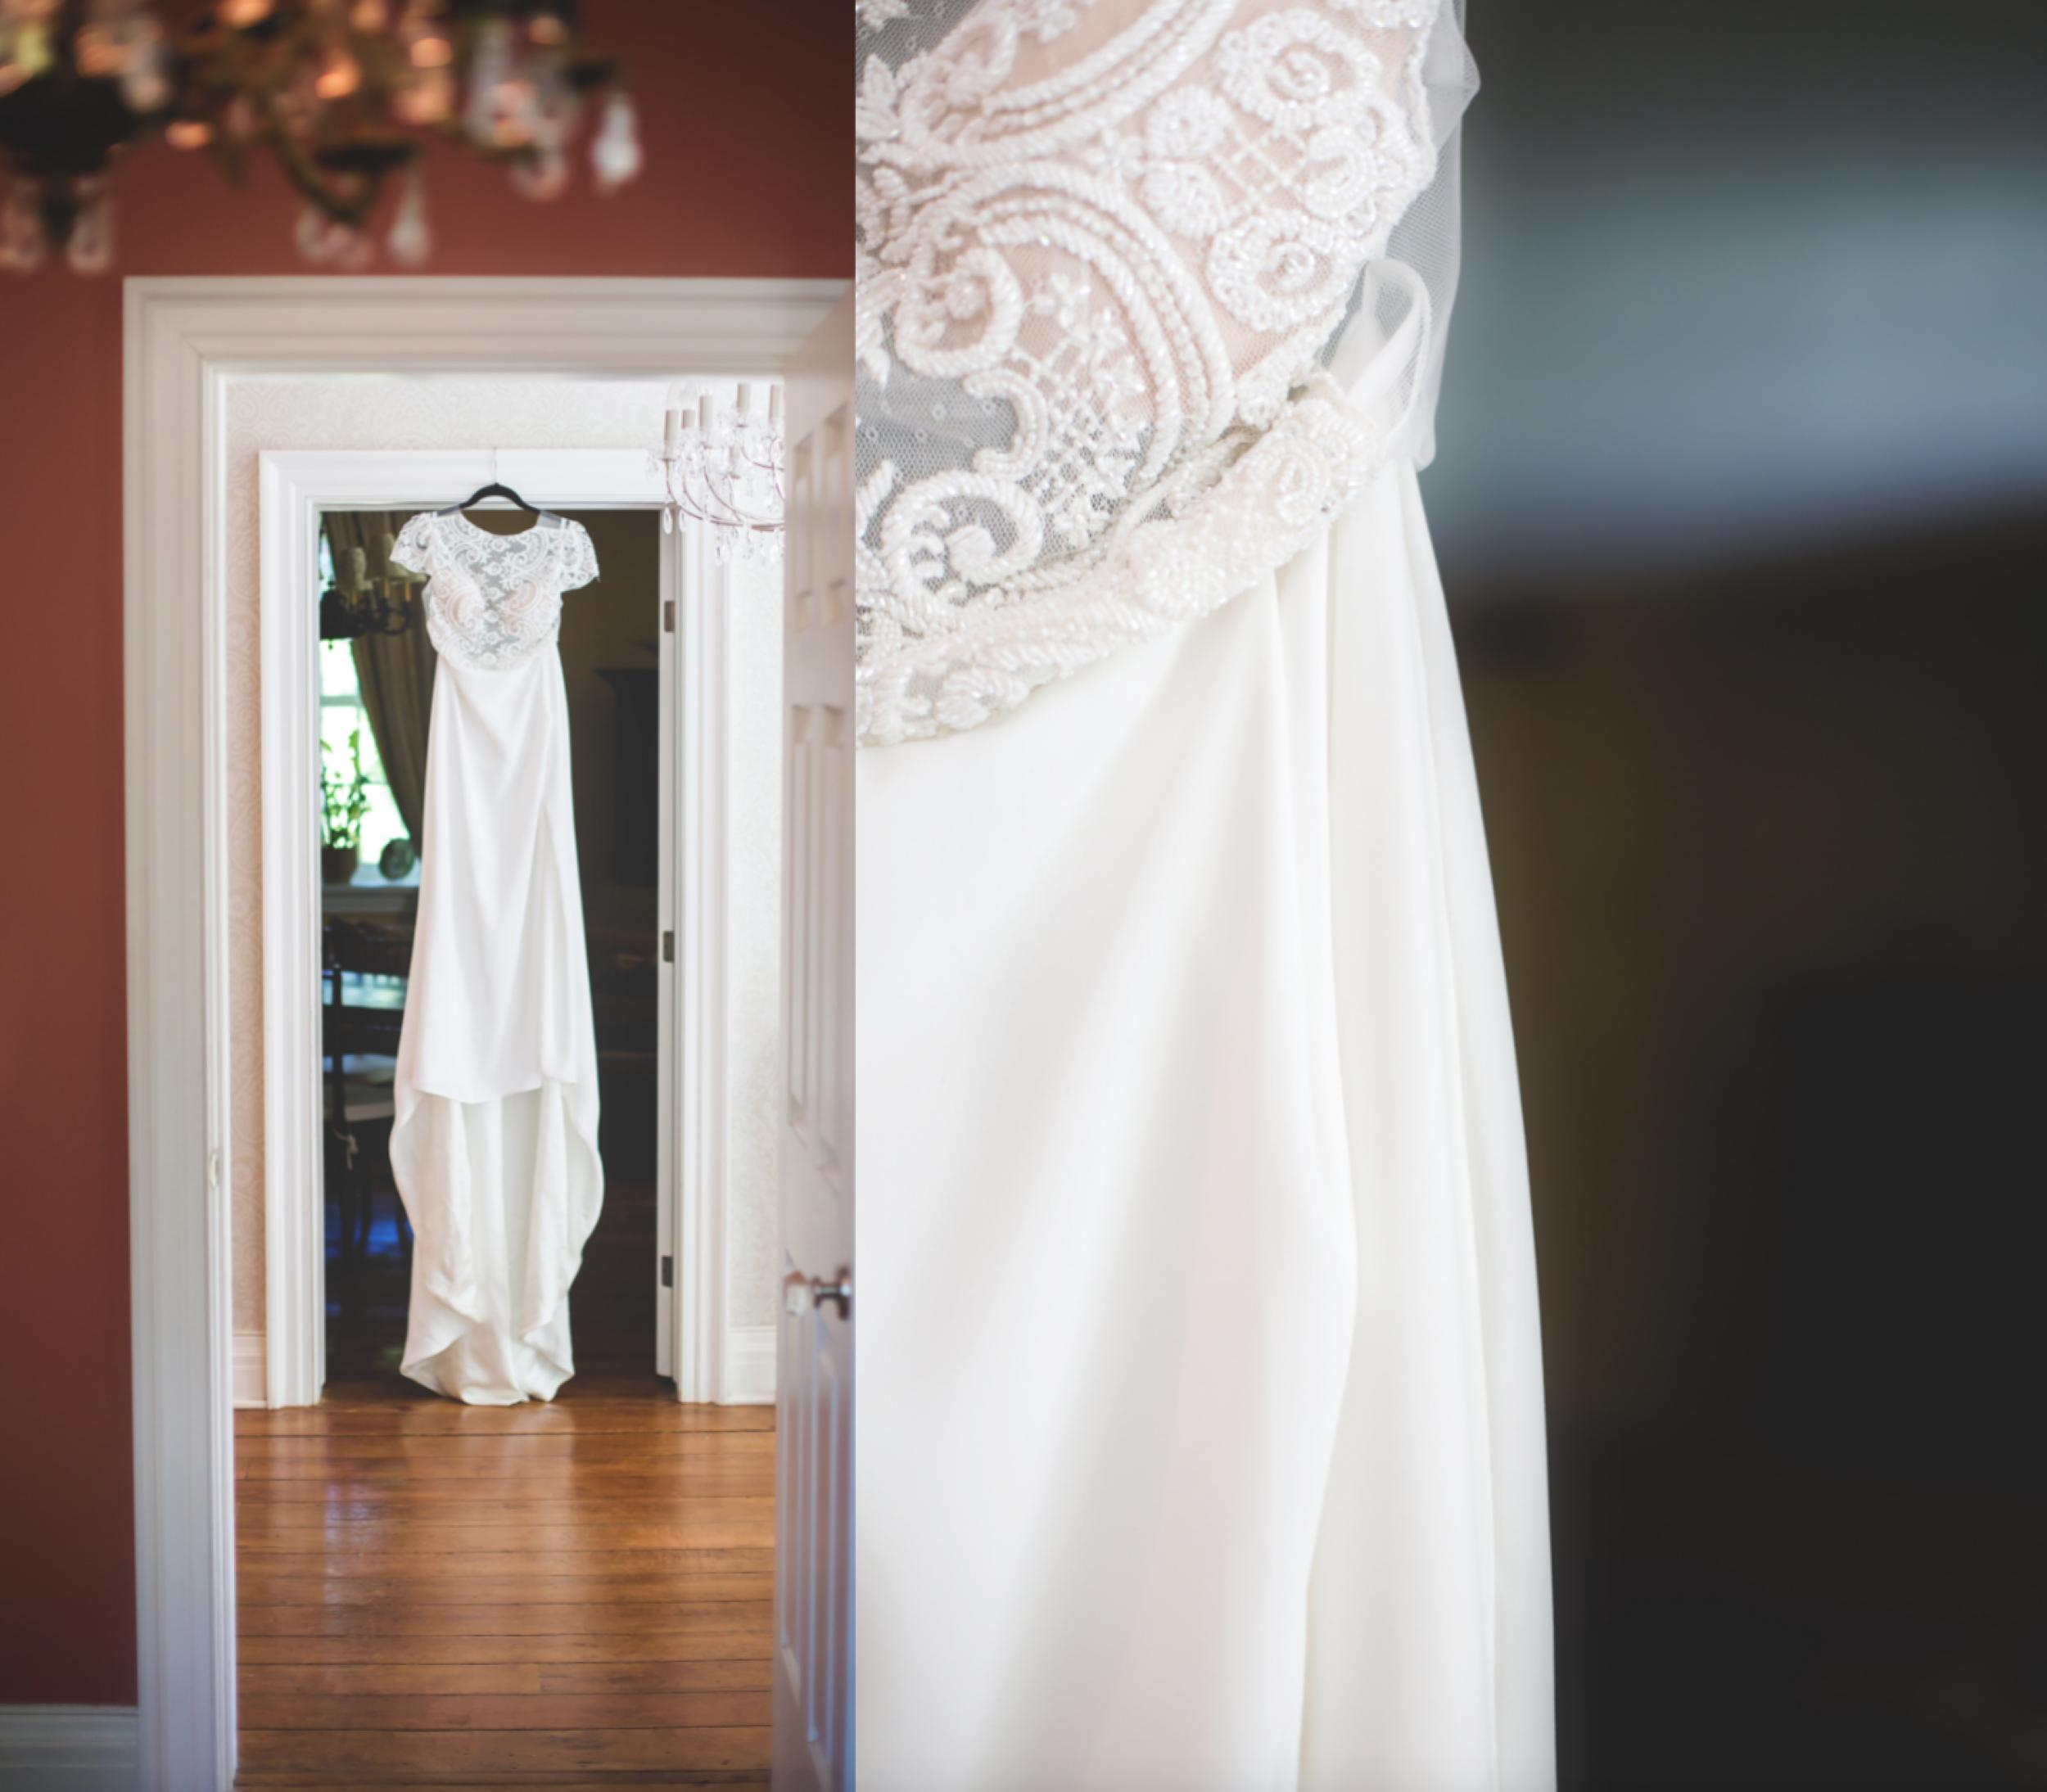 Wedding-Kurtz-Orchard-Market-Niagara-On-The-Lake-Toronto-Hamilton-Burlington-Oakville-Niagara-Wedding-Photographer-Photography-Moments-by-Lauren-Photo-Image-3.png